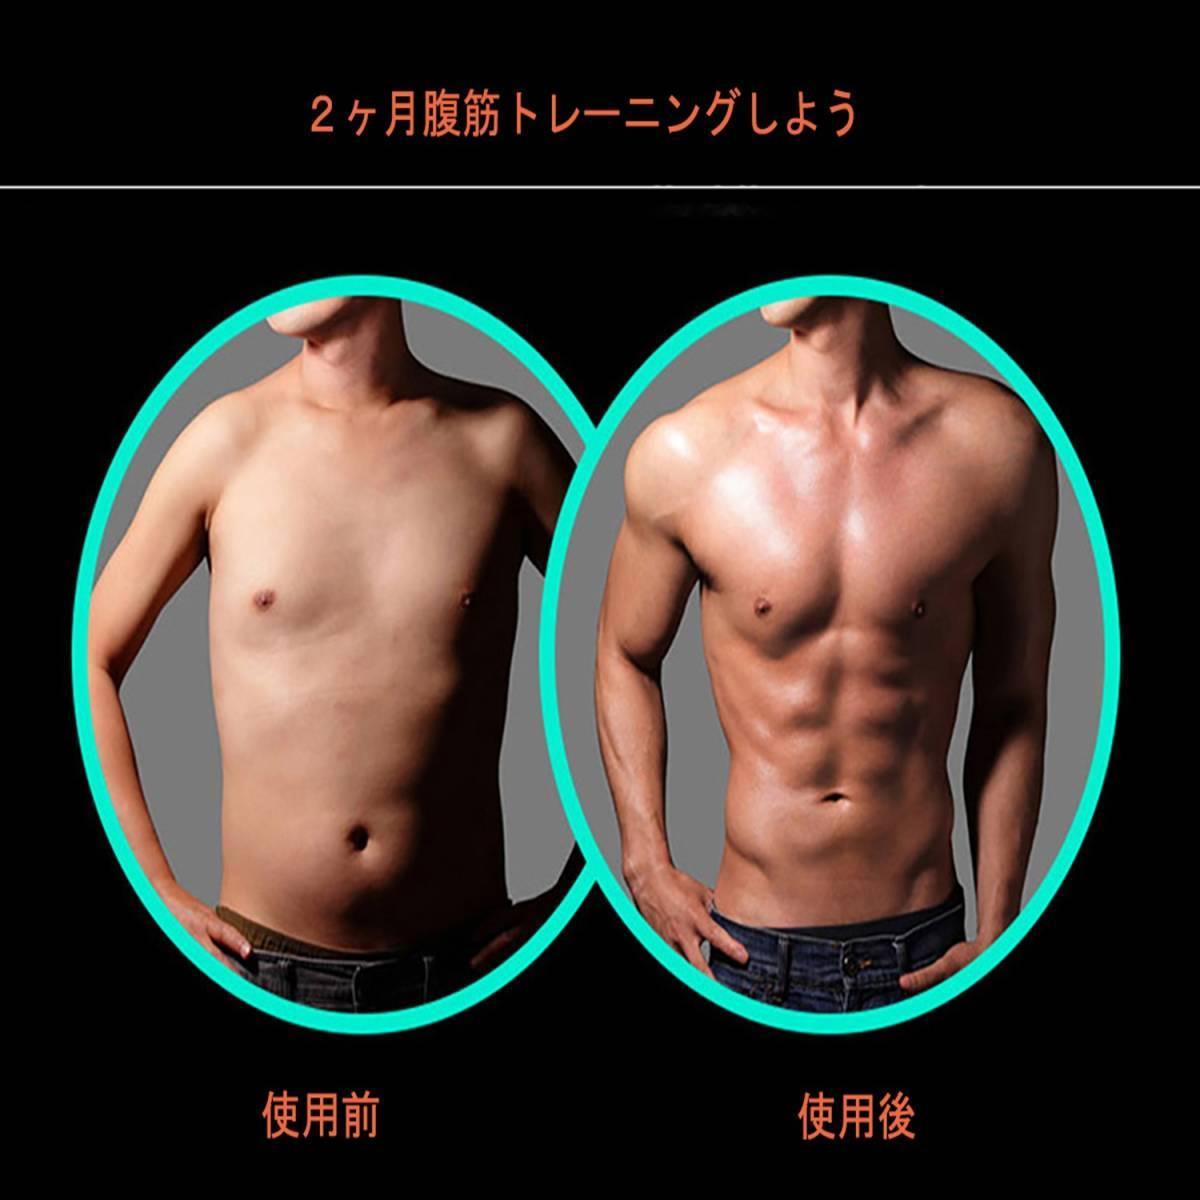 EMS 腹筋ベルト 腹筋マシーン 腹筋パッド 太もも 腕筋 筋トレ器具 ダイエット USB充電式 マッサージ エクササイズ 男女兼用 新品 _画像8